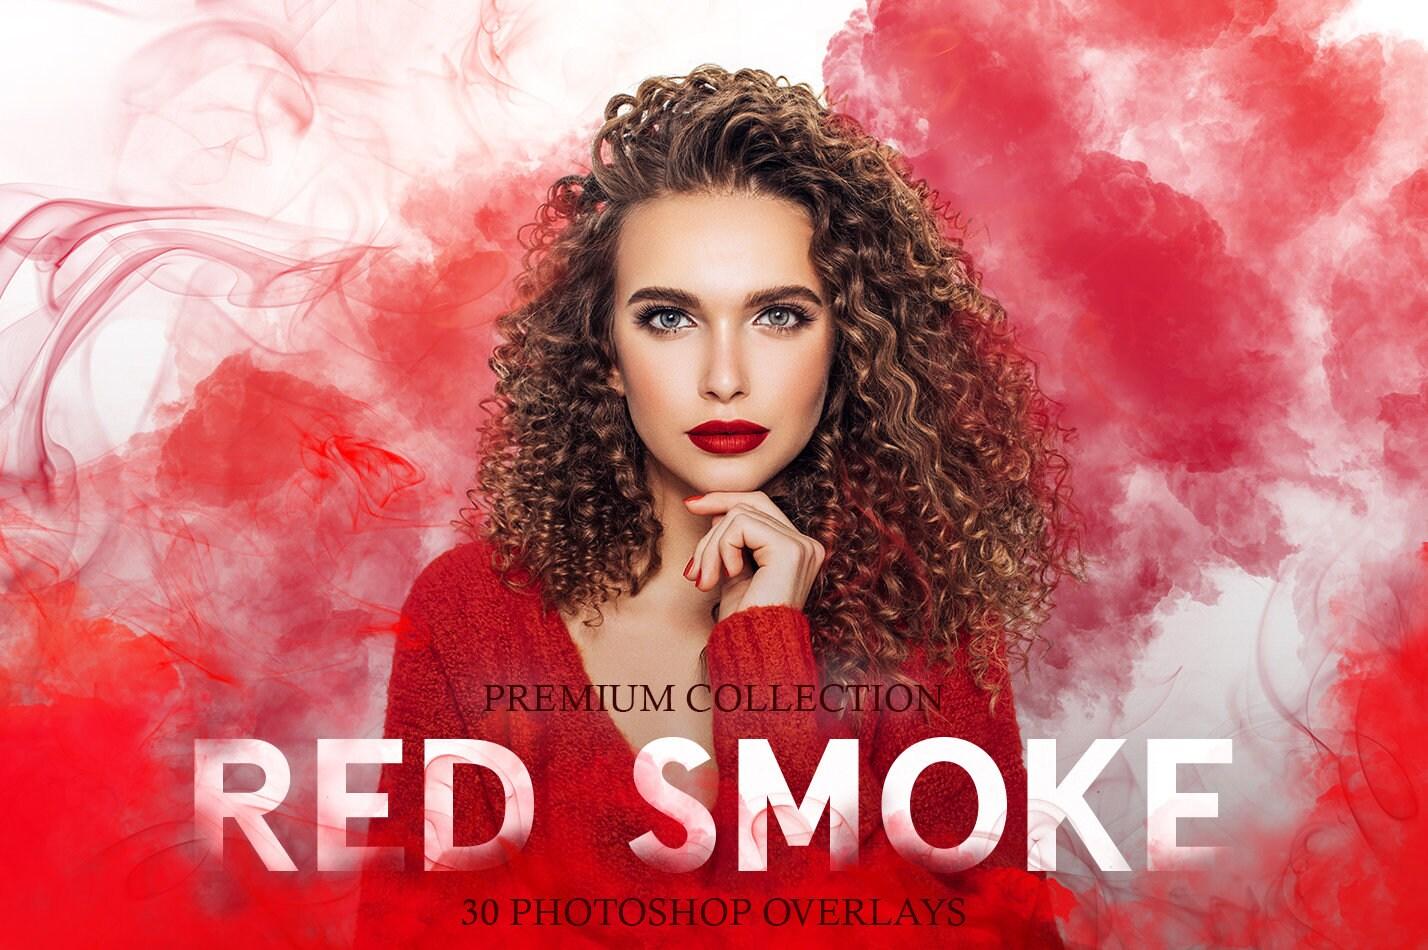 Red Smoke Photoshop Overlays [Red Smoke Overlay, Red Smoke PNG, Red Smoke  PNG Transparent, PNG Red Smoke]